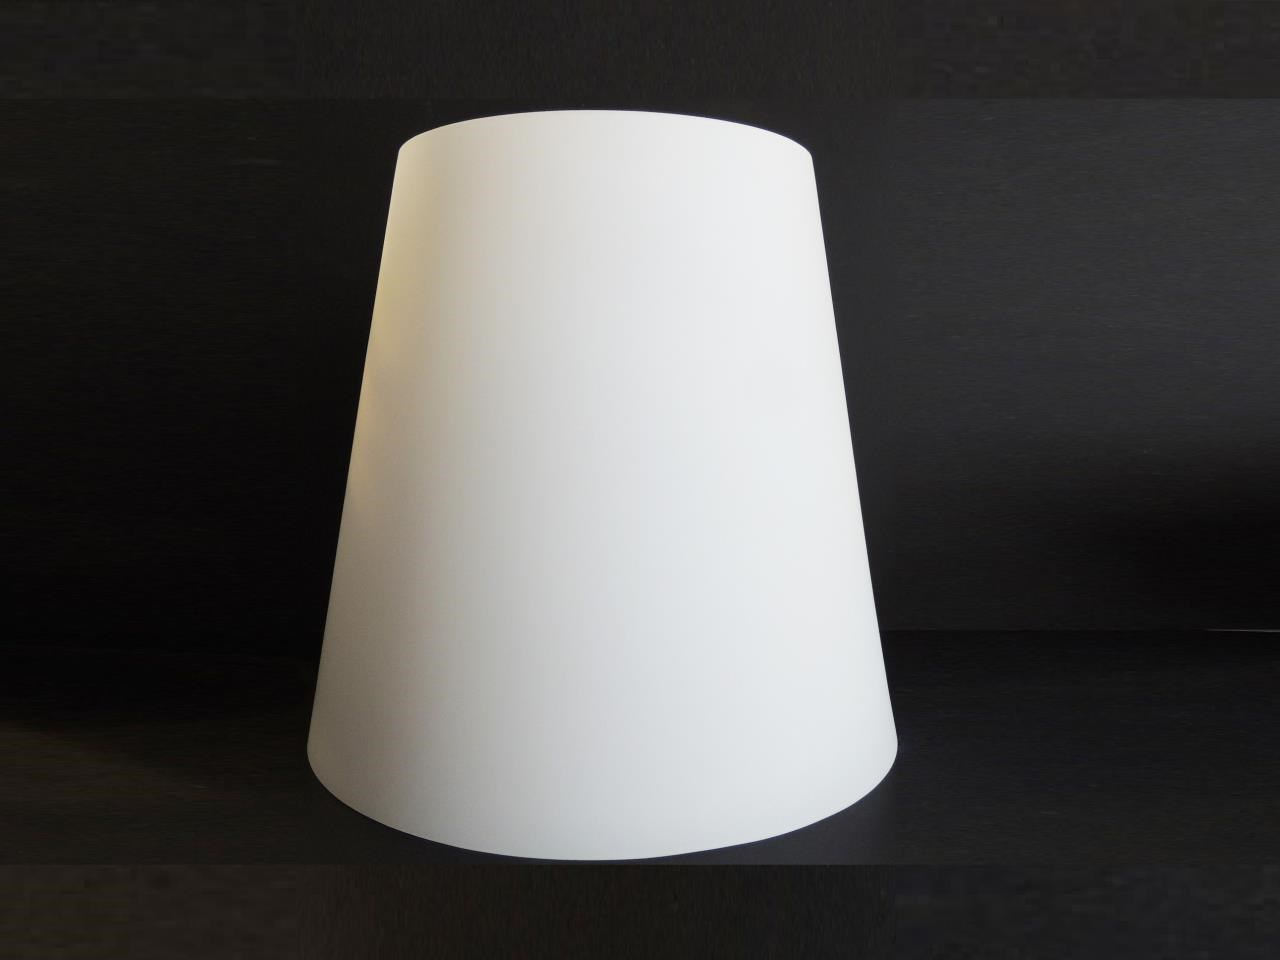 Vetro di ricambio per lampada paralume per applique abat-jour lampadari bianco